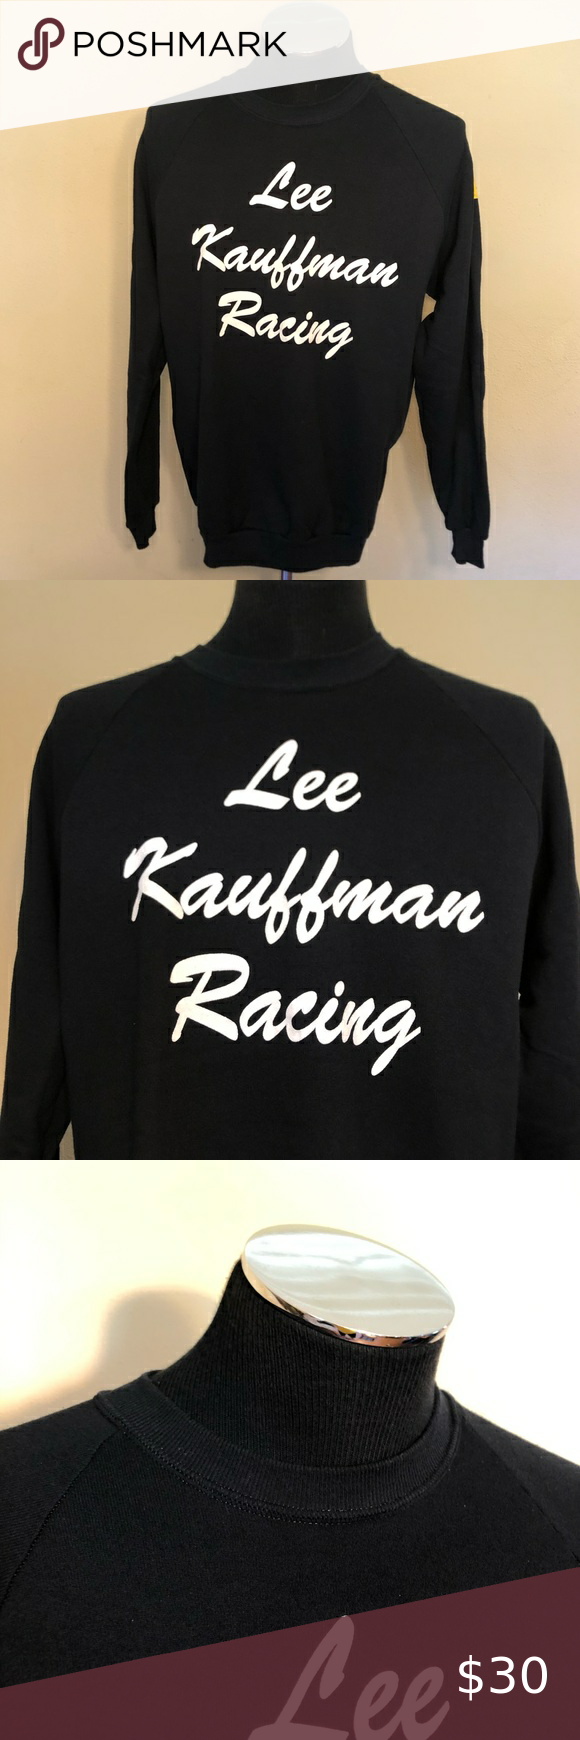 Vintage Lee Kauffman Racing Crew Neck Sweatshirt Vtg Lee Kauffman Racing Team Crew Neck Sweatshirt Size Xl C Crew Neck Sweatshirt Sweatshirts Sweatshirt Shirt [ 1740 x 580 Pixel ]